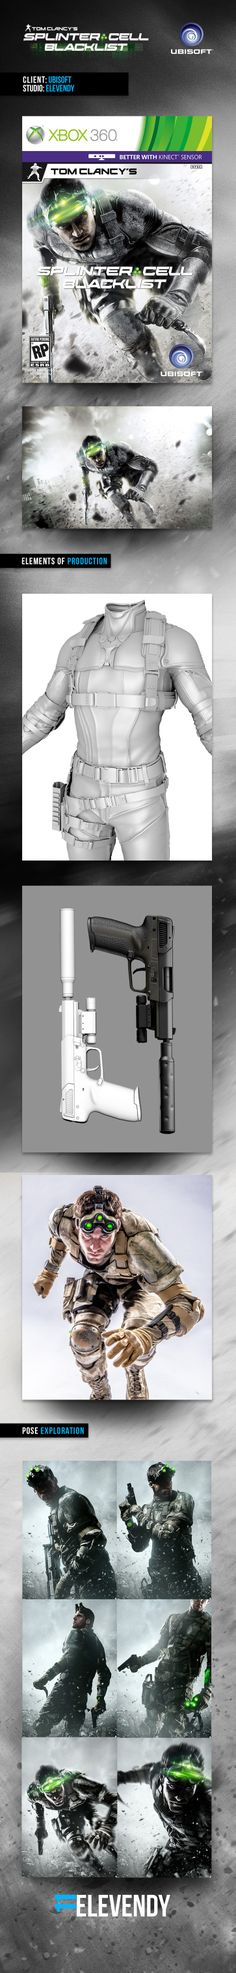 Pack art (Key Art) for Tom Clancy's Splinter Cell: Blacklist by Elevendy Studio #splinter #cell #Blacklist #tomclancy #video #game #ubisoft #www.infinitemarketing.info